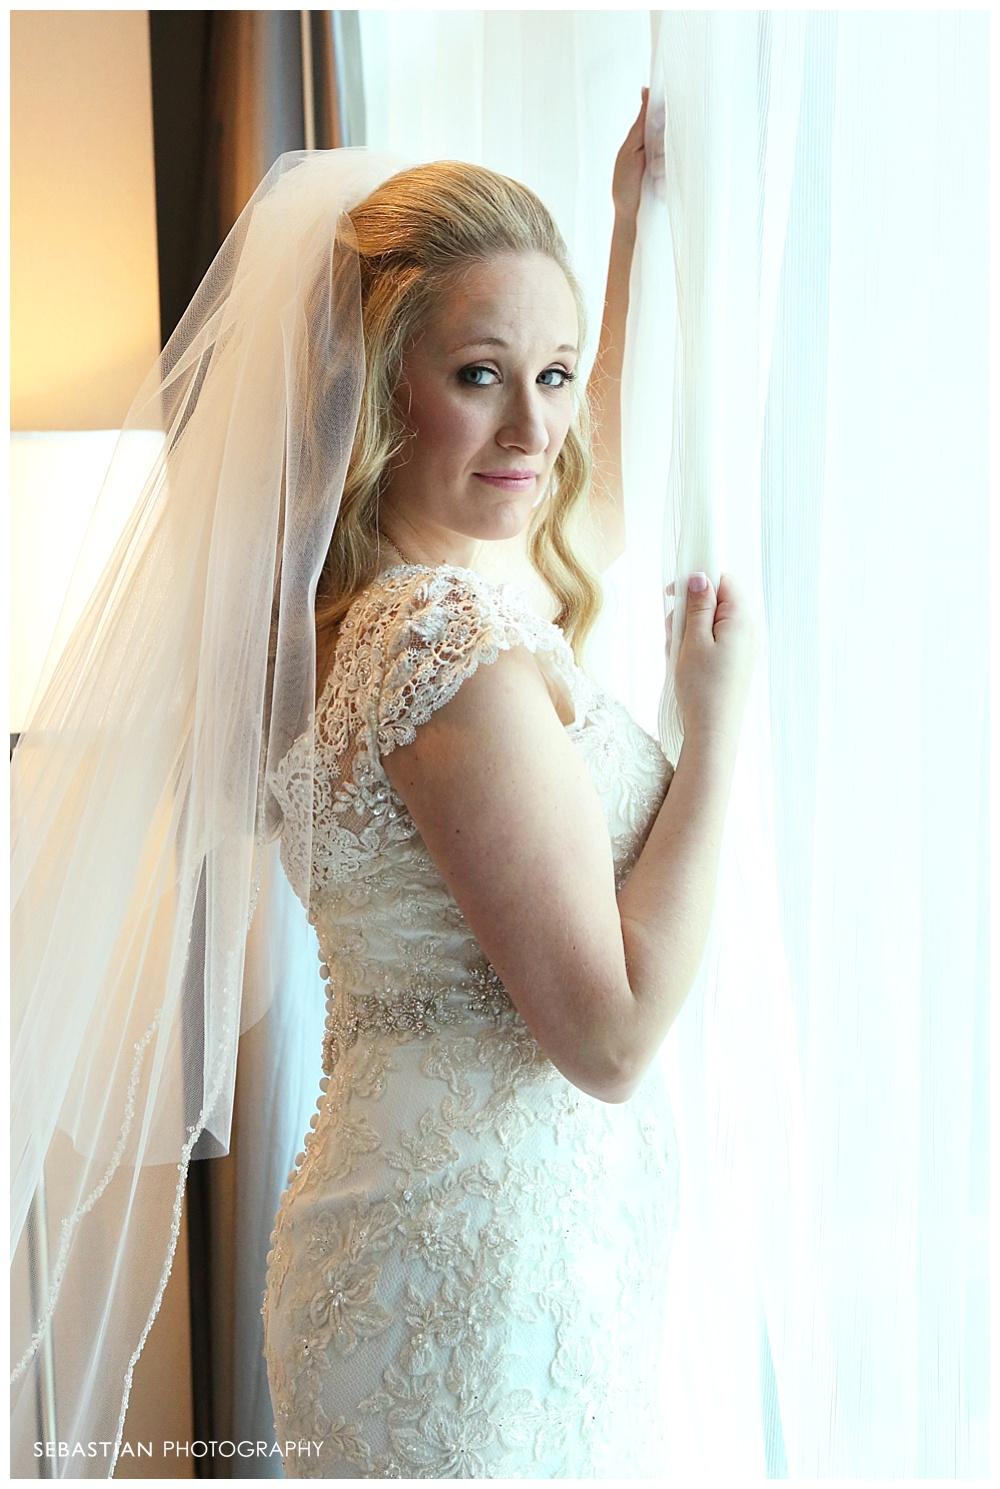 Sebastian_Photography_Lake_Of_Isles_NorthStonington_CT_Wedding_Pictures_05.jpg